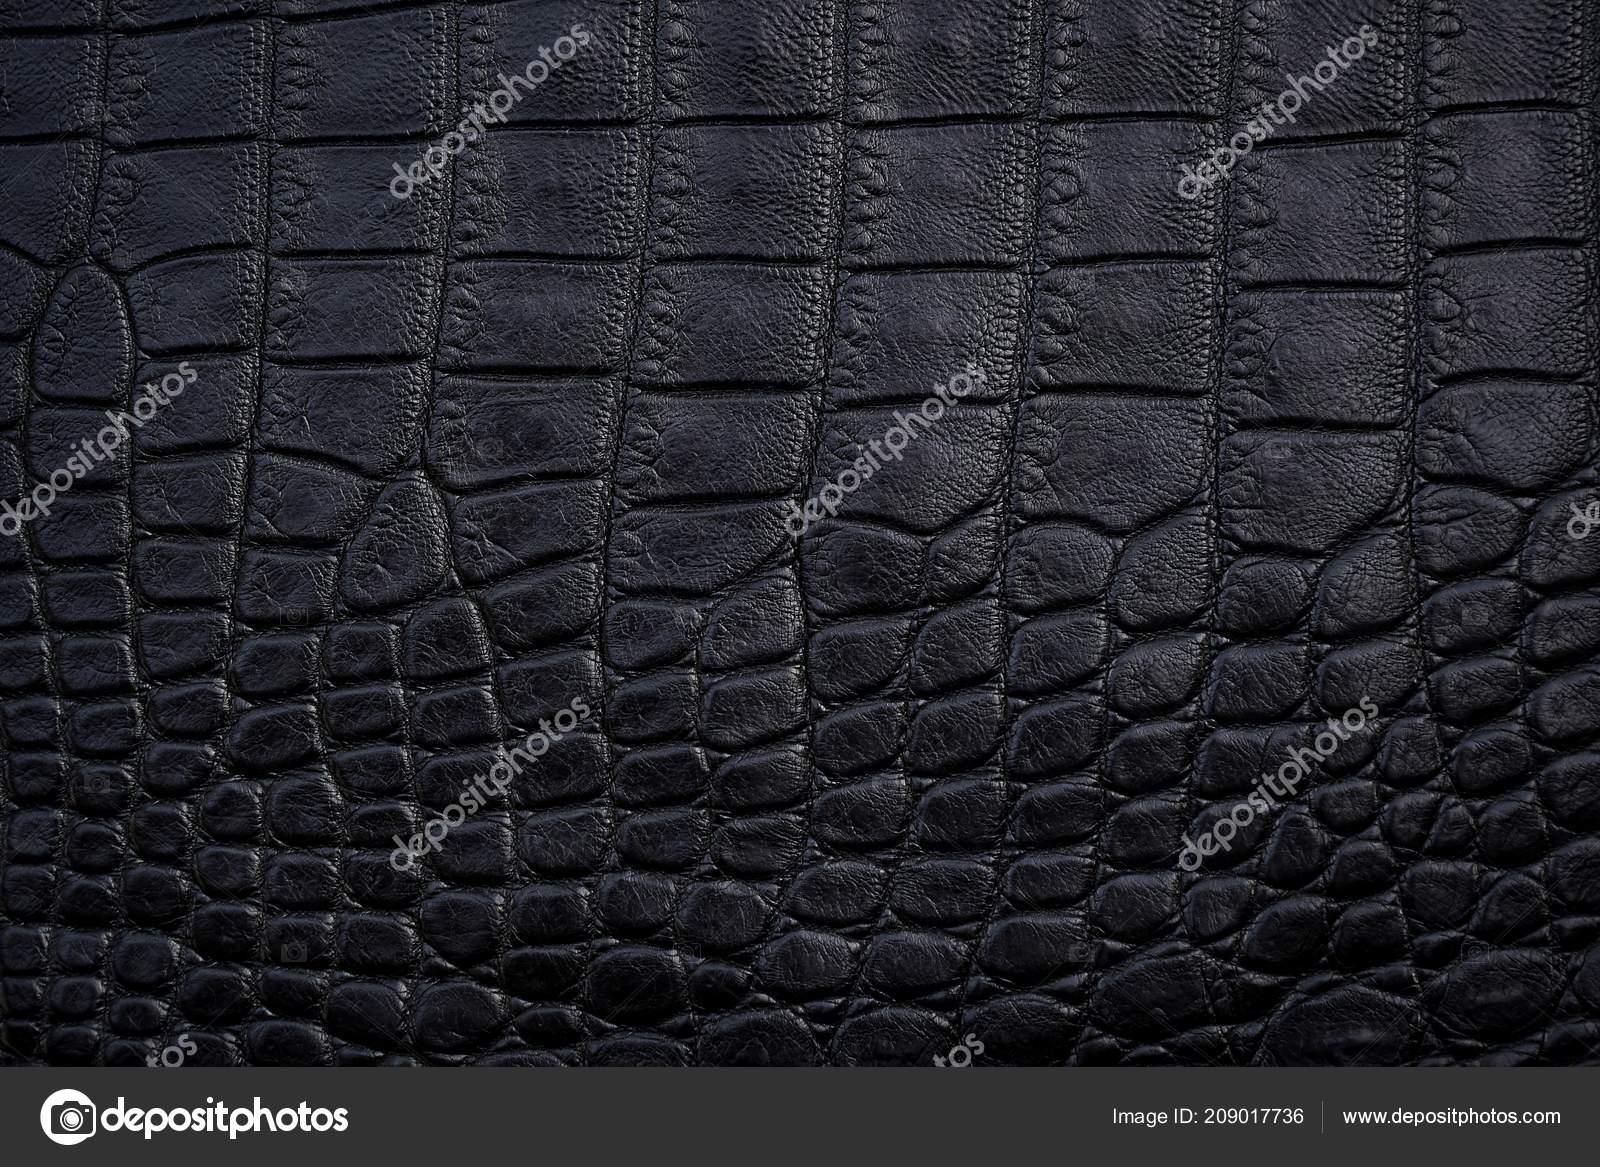 Close Black Crocodile Alligator Belly Skin Texture Use